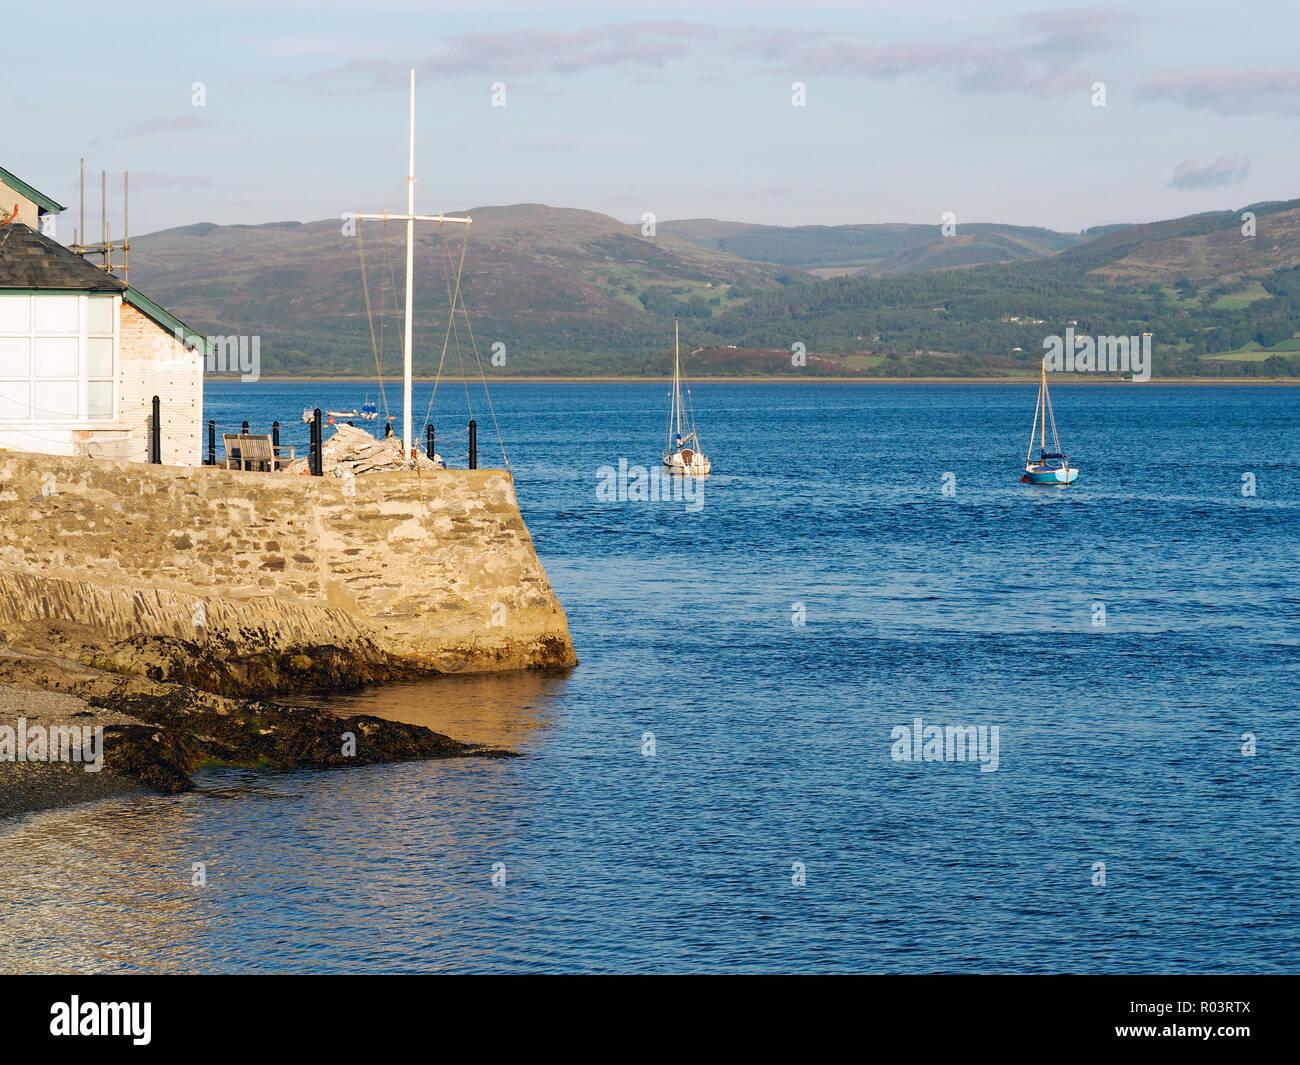 Late summer evening scene on the Dovey (Dyfi) estuary at Aberdovey (Aberdyfi) in Wales. Stock Photo